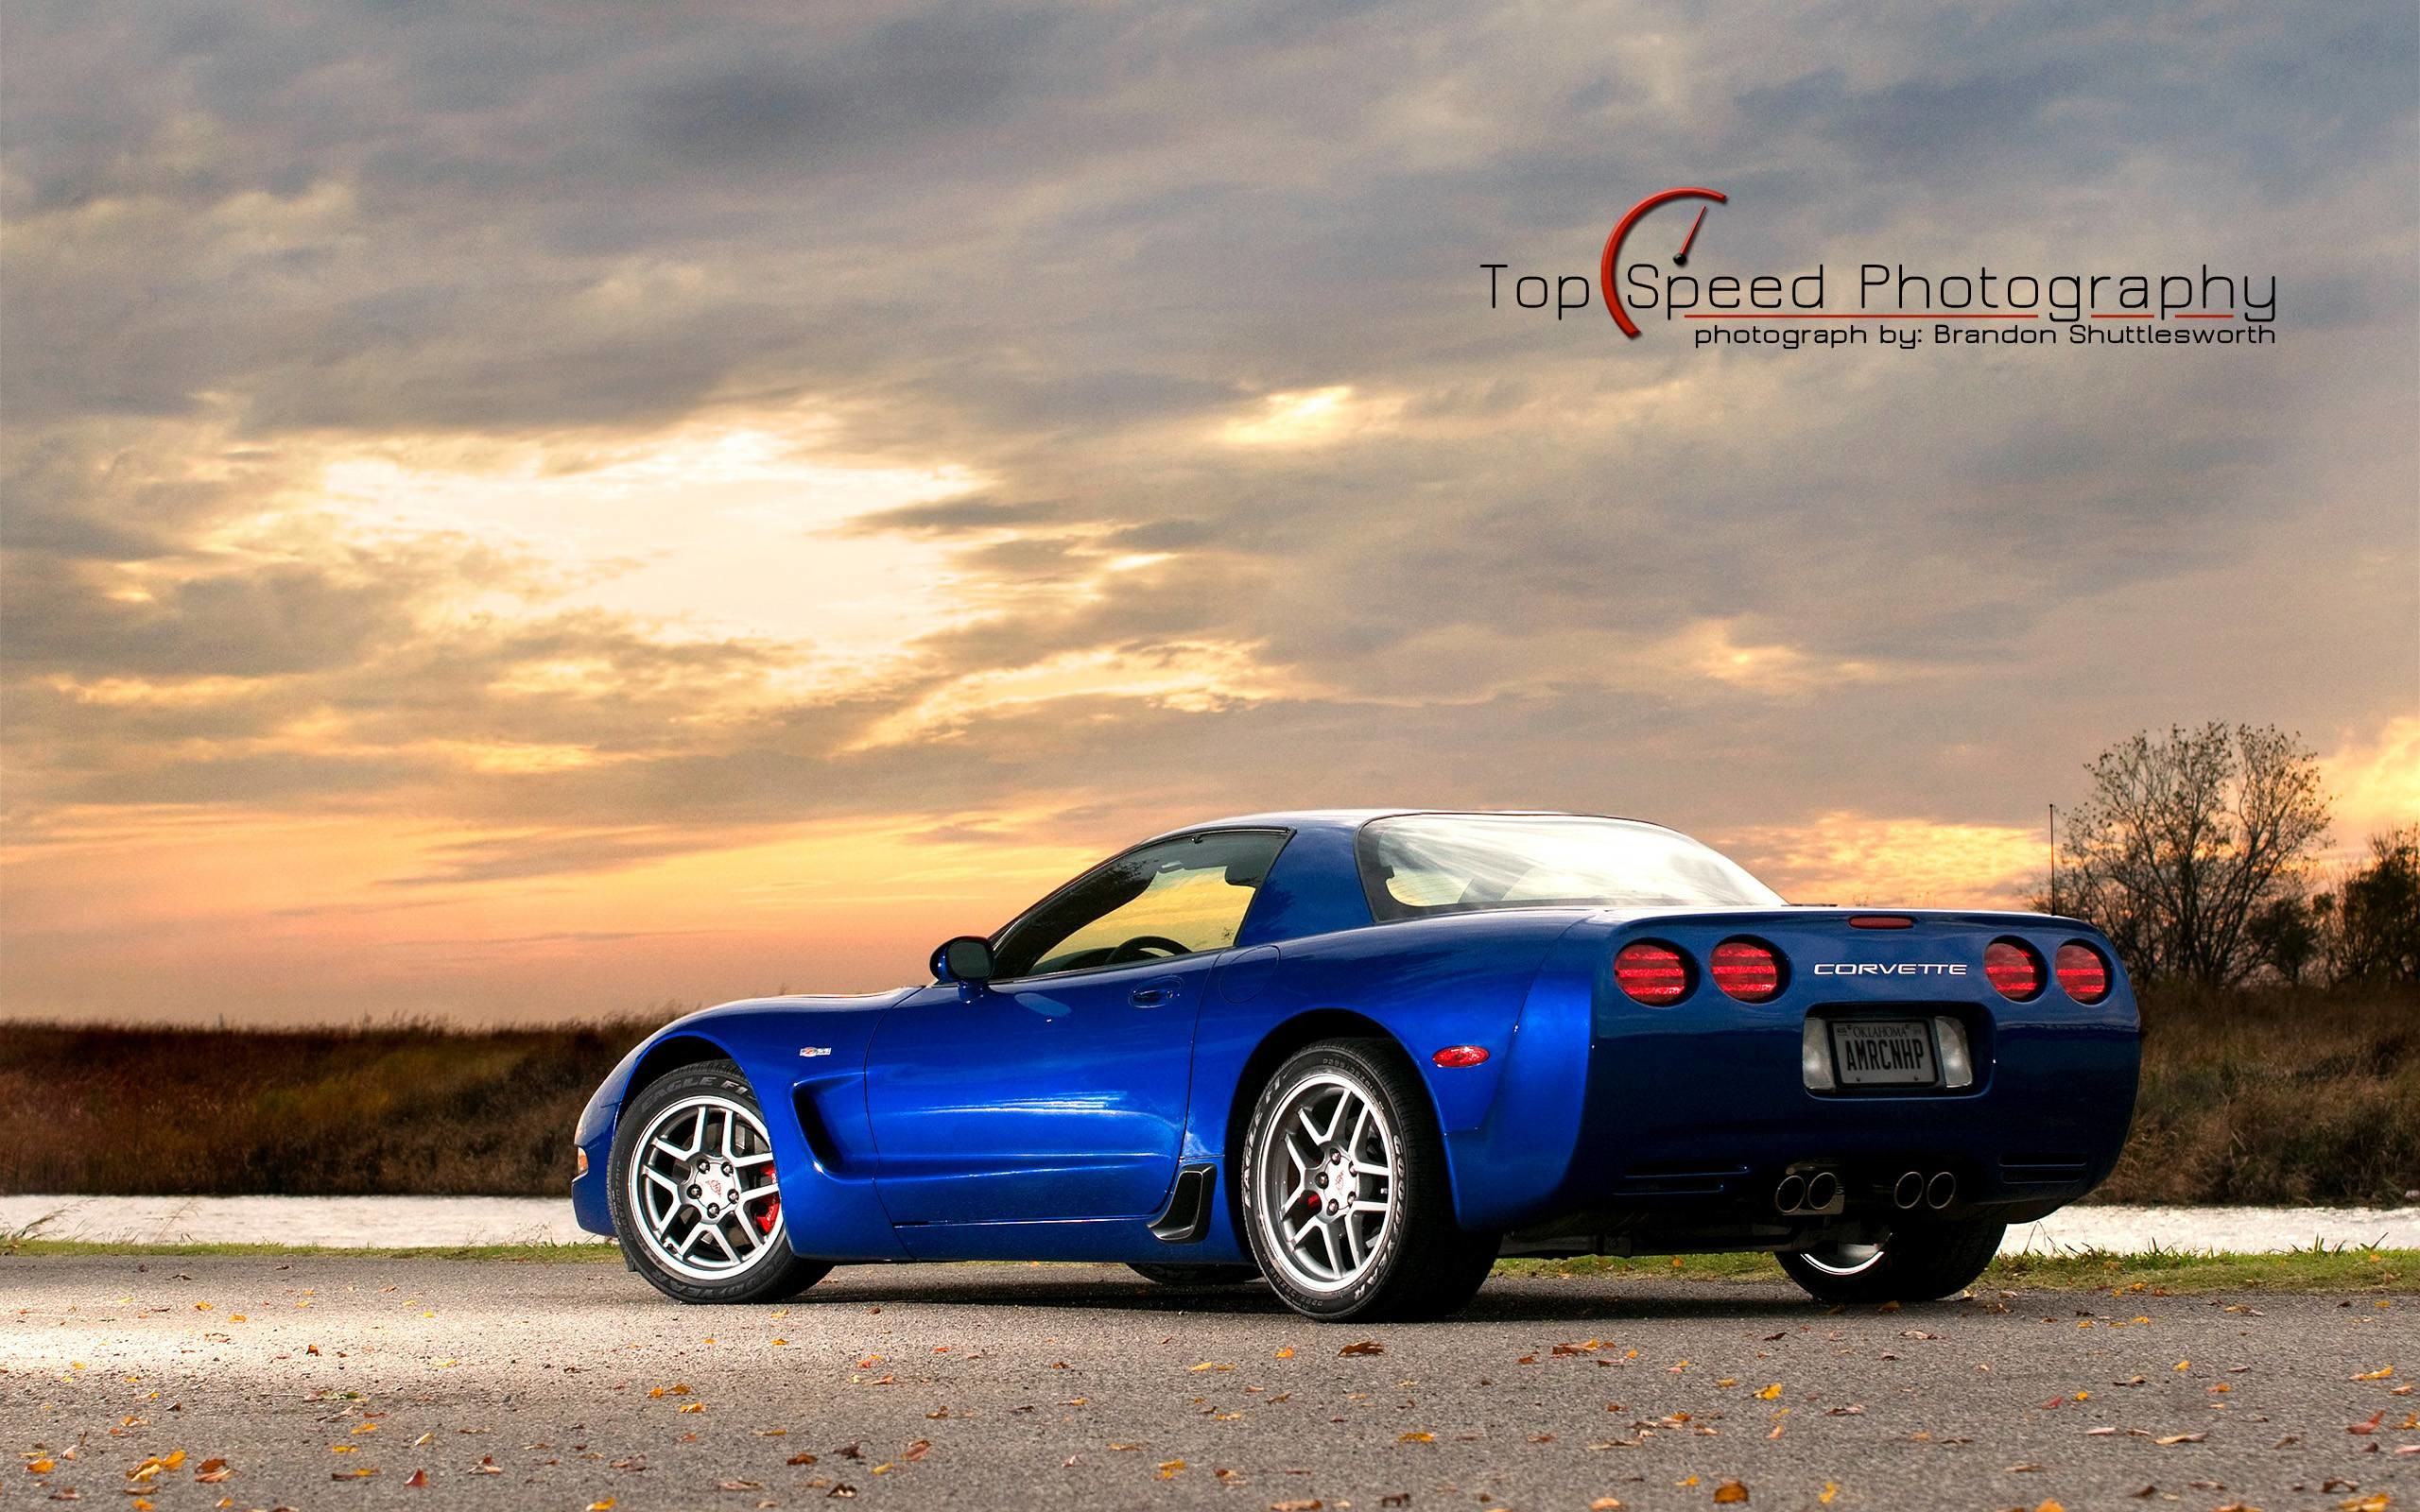 63 C5 Corvette Wallpapers on WallpaperPlay 2560x1600